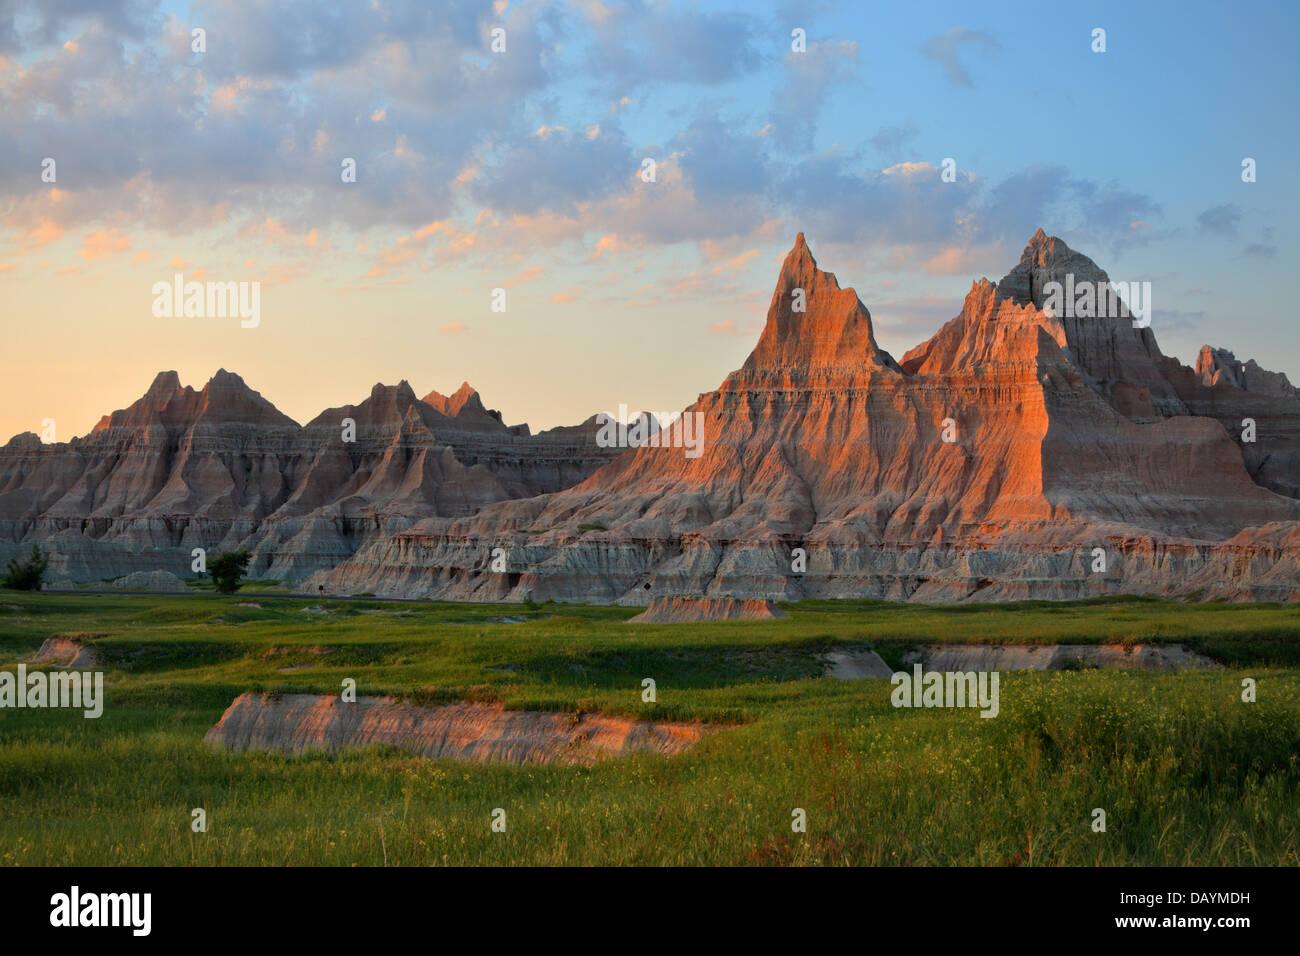 Summer sunset lights Vampire Peaks in Badlands National Park, Interior, South Dakota - Stock Image